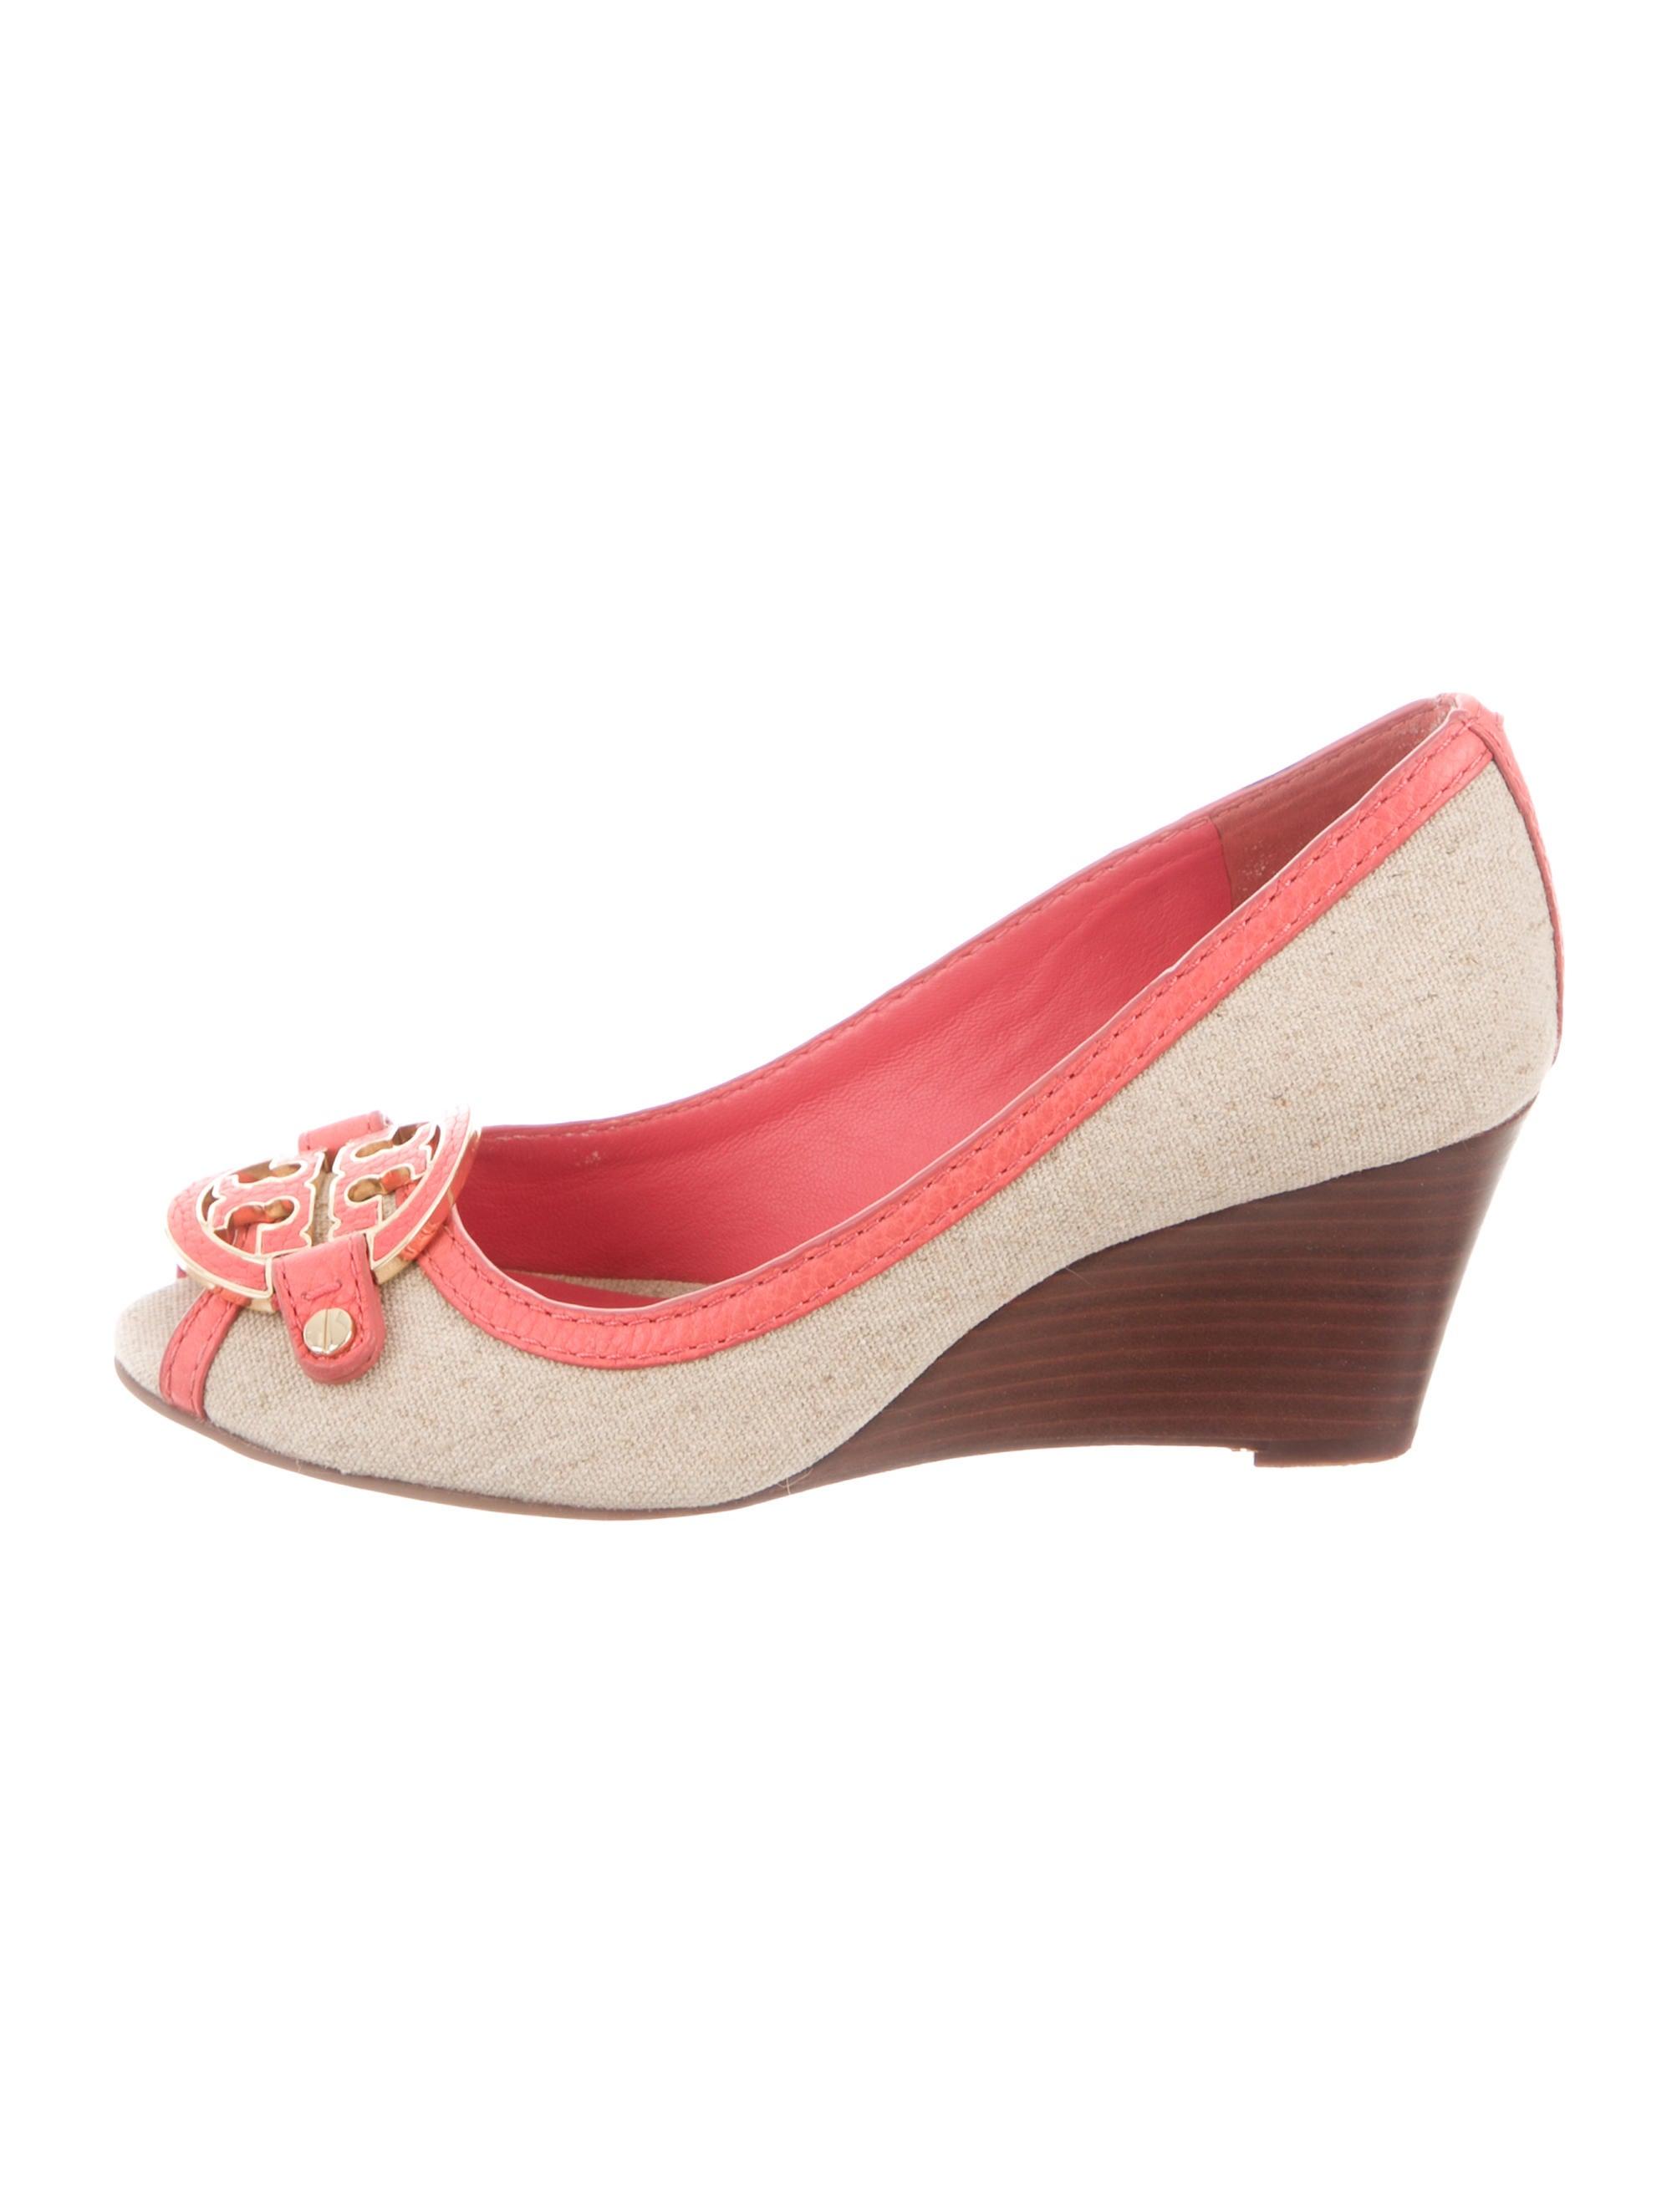 b6b4909b7dd4 Tory Burch Amanda Peep-Toe Wedge Sandals - Shoes - WTO116600